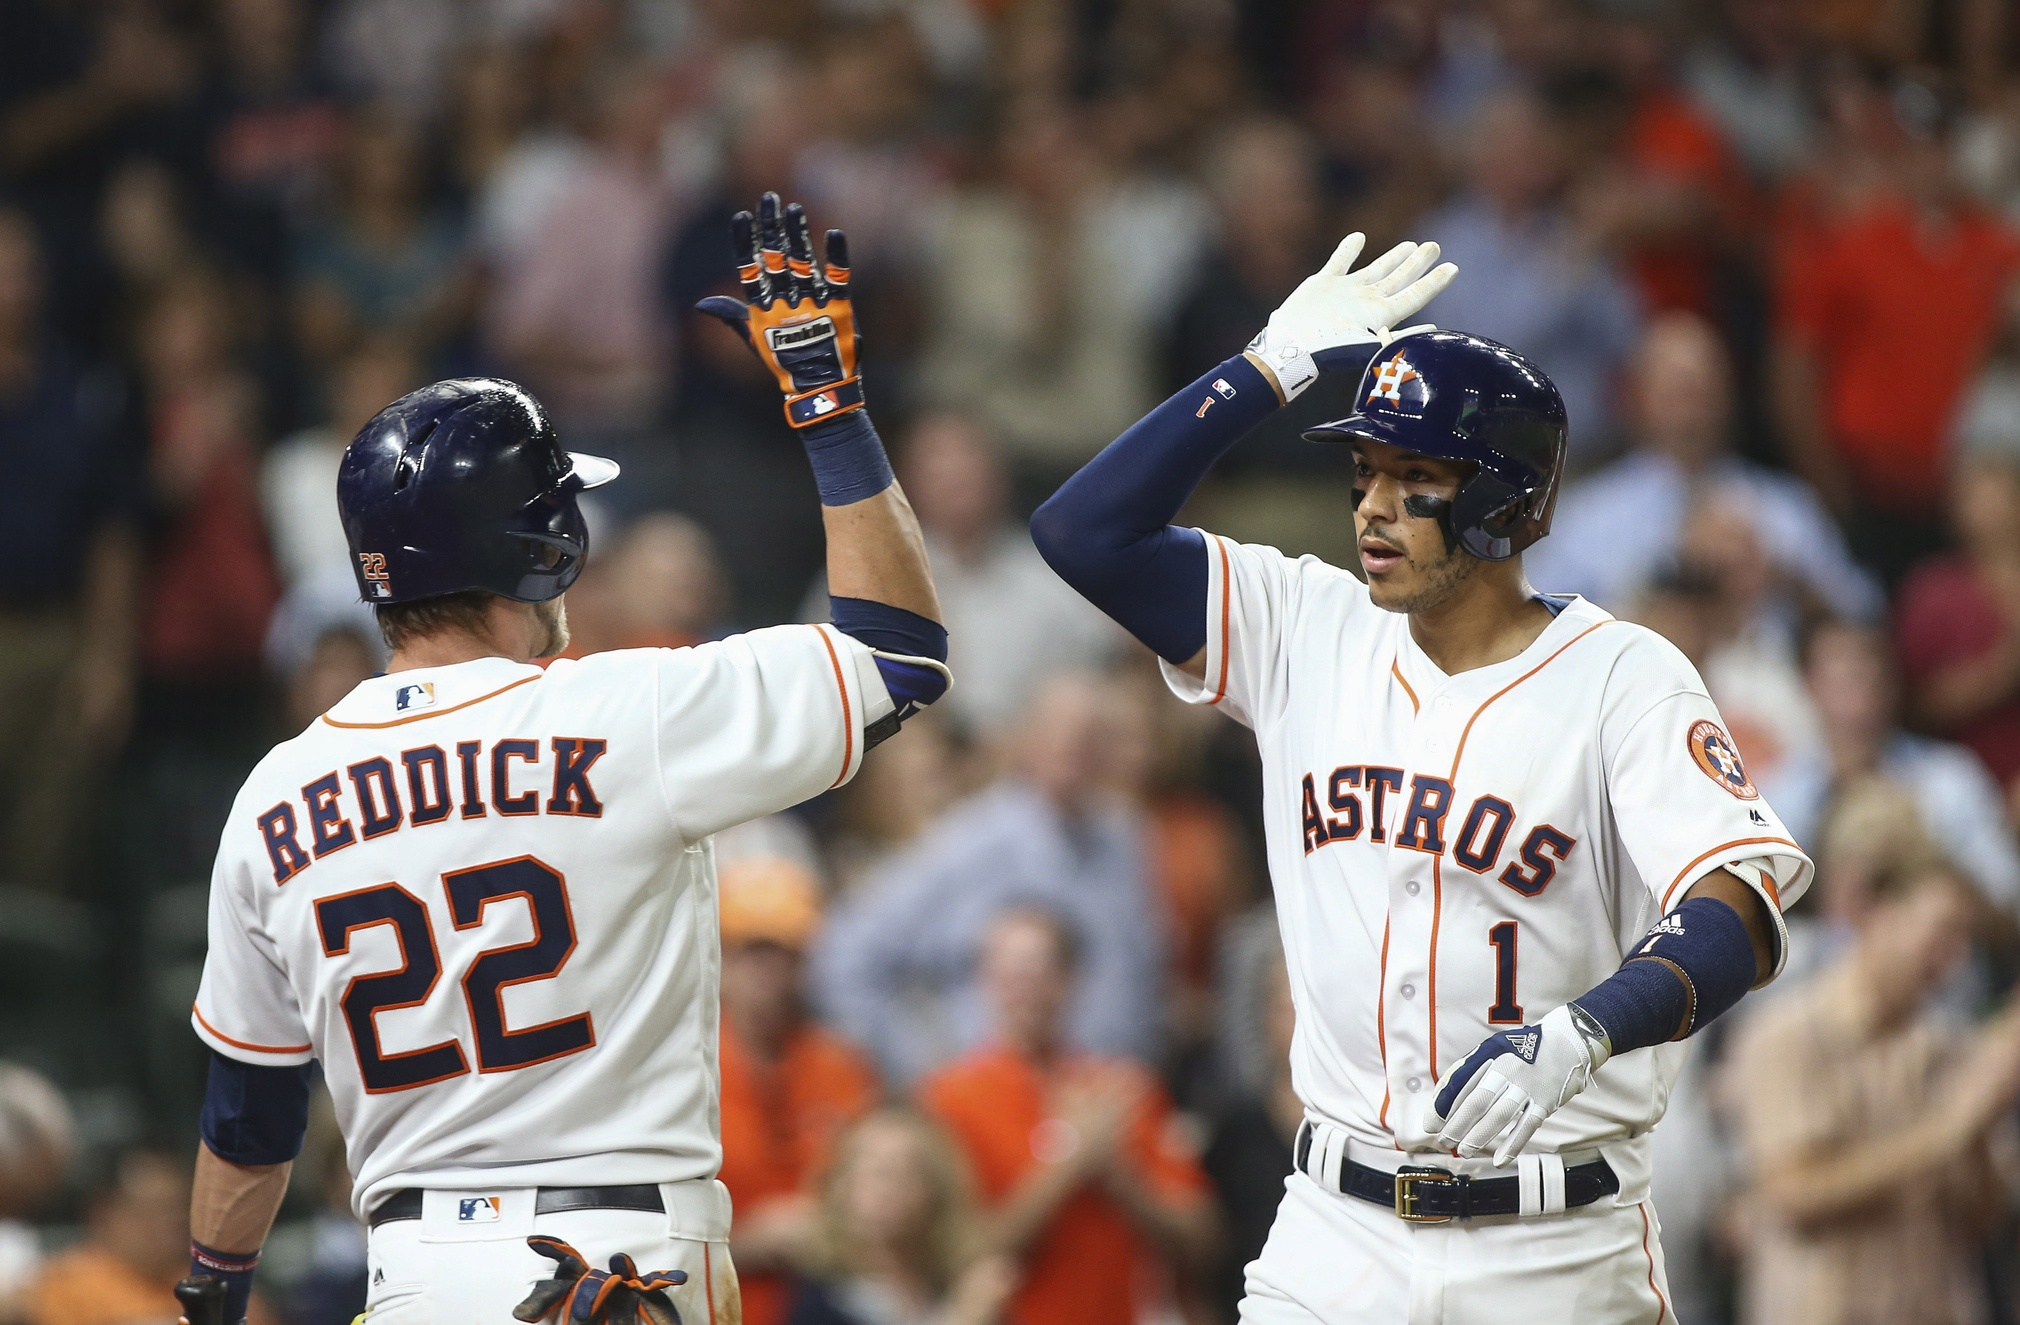 Carlos Correa and Josh Reddick